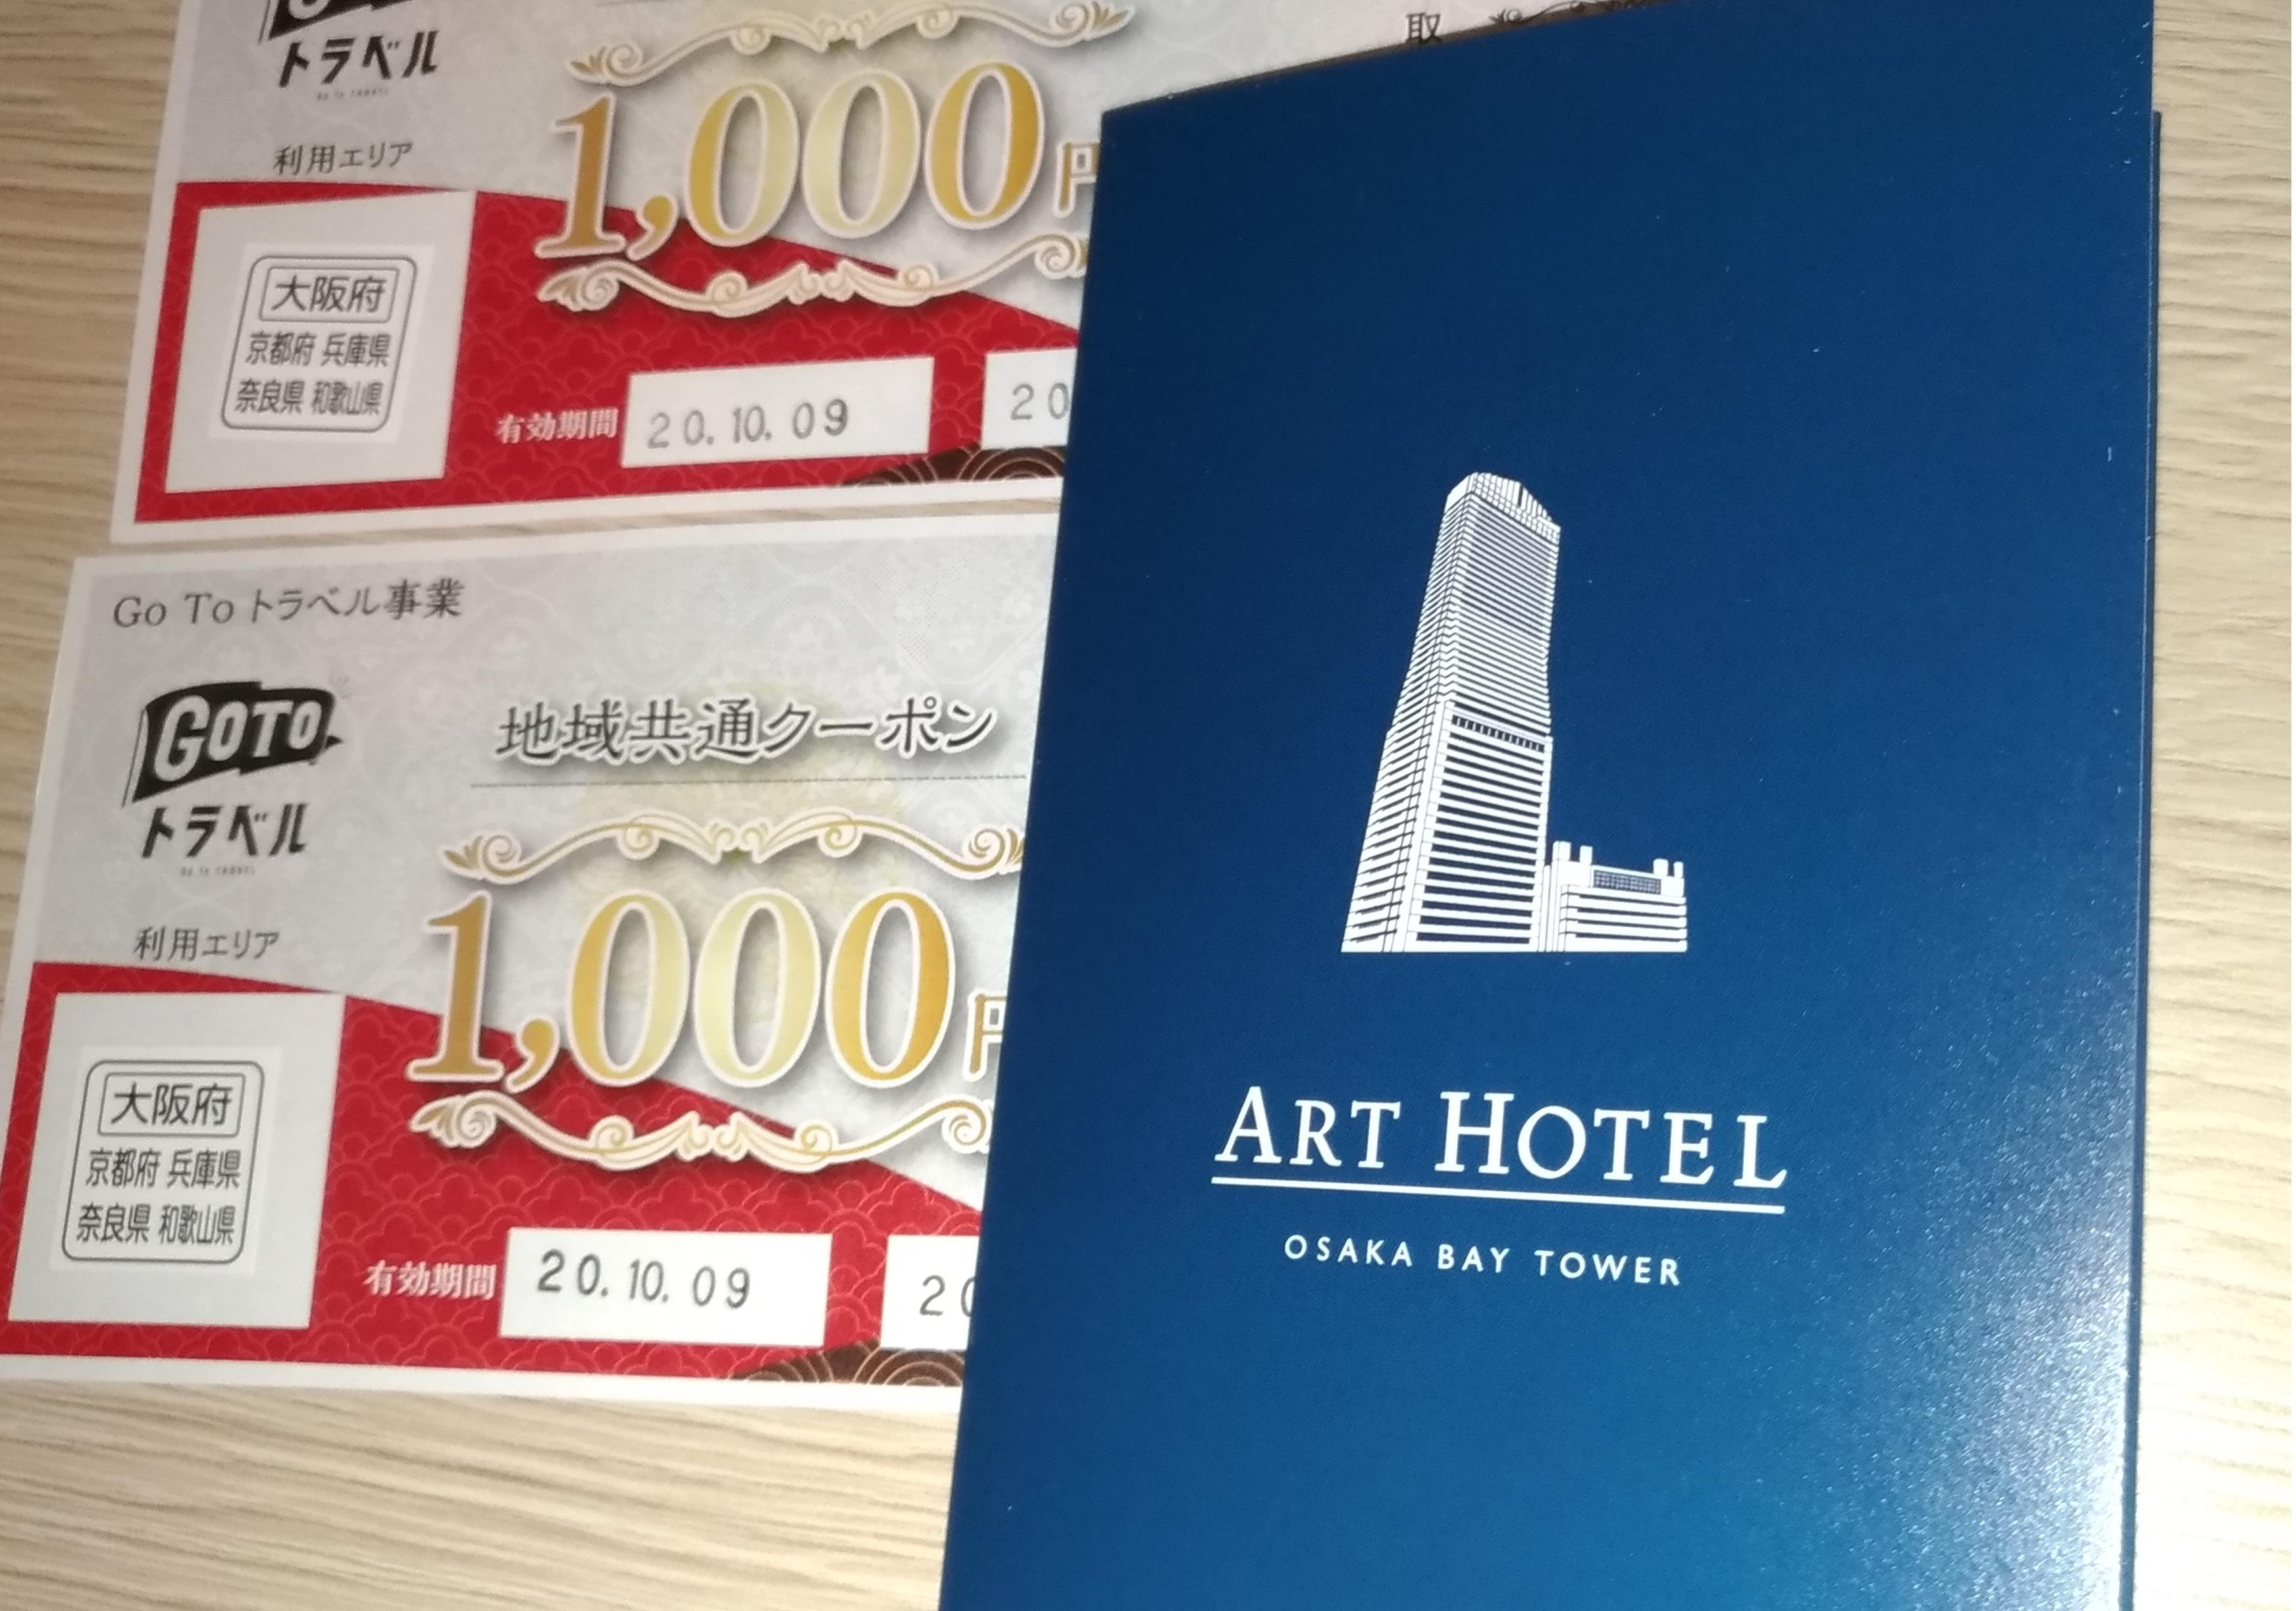 art_hotel_osaka_bay_tower_1009_1.jpg